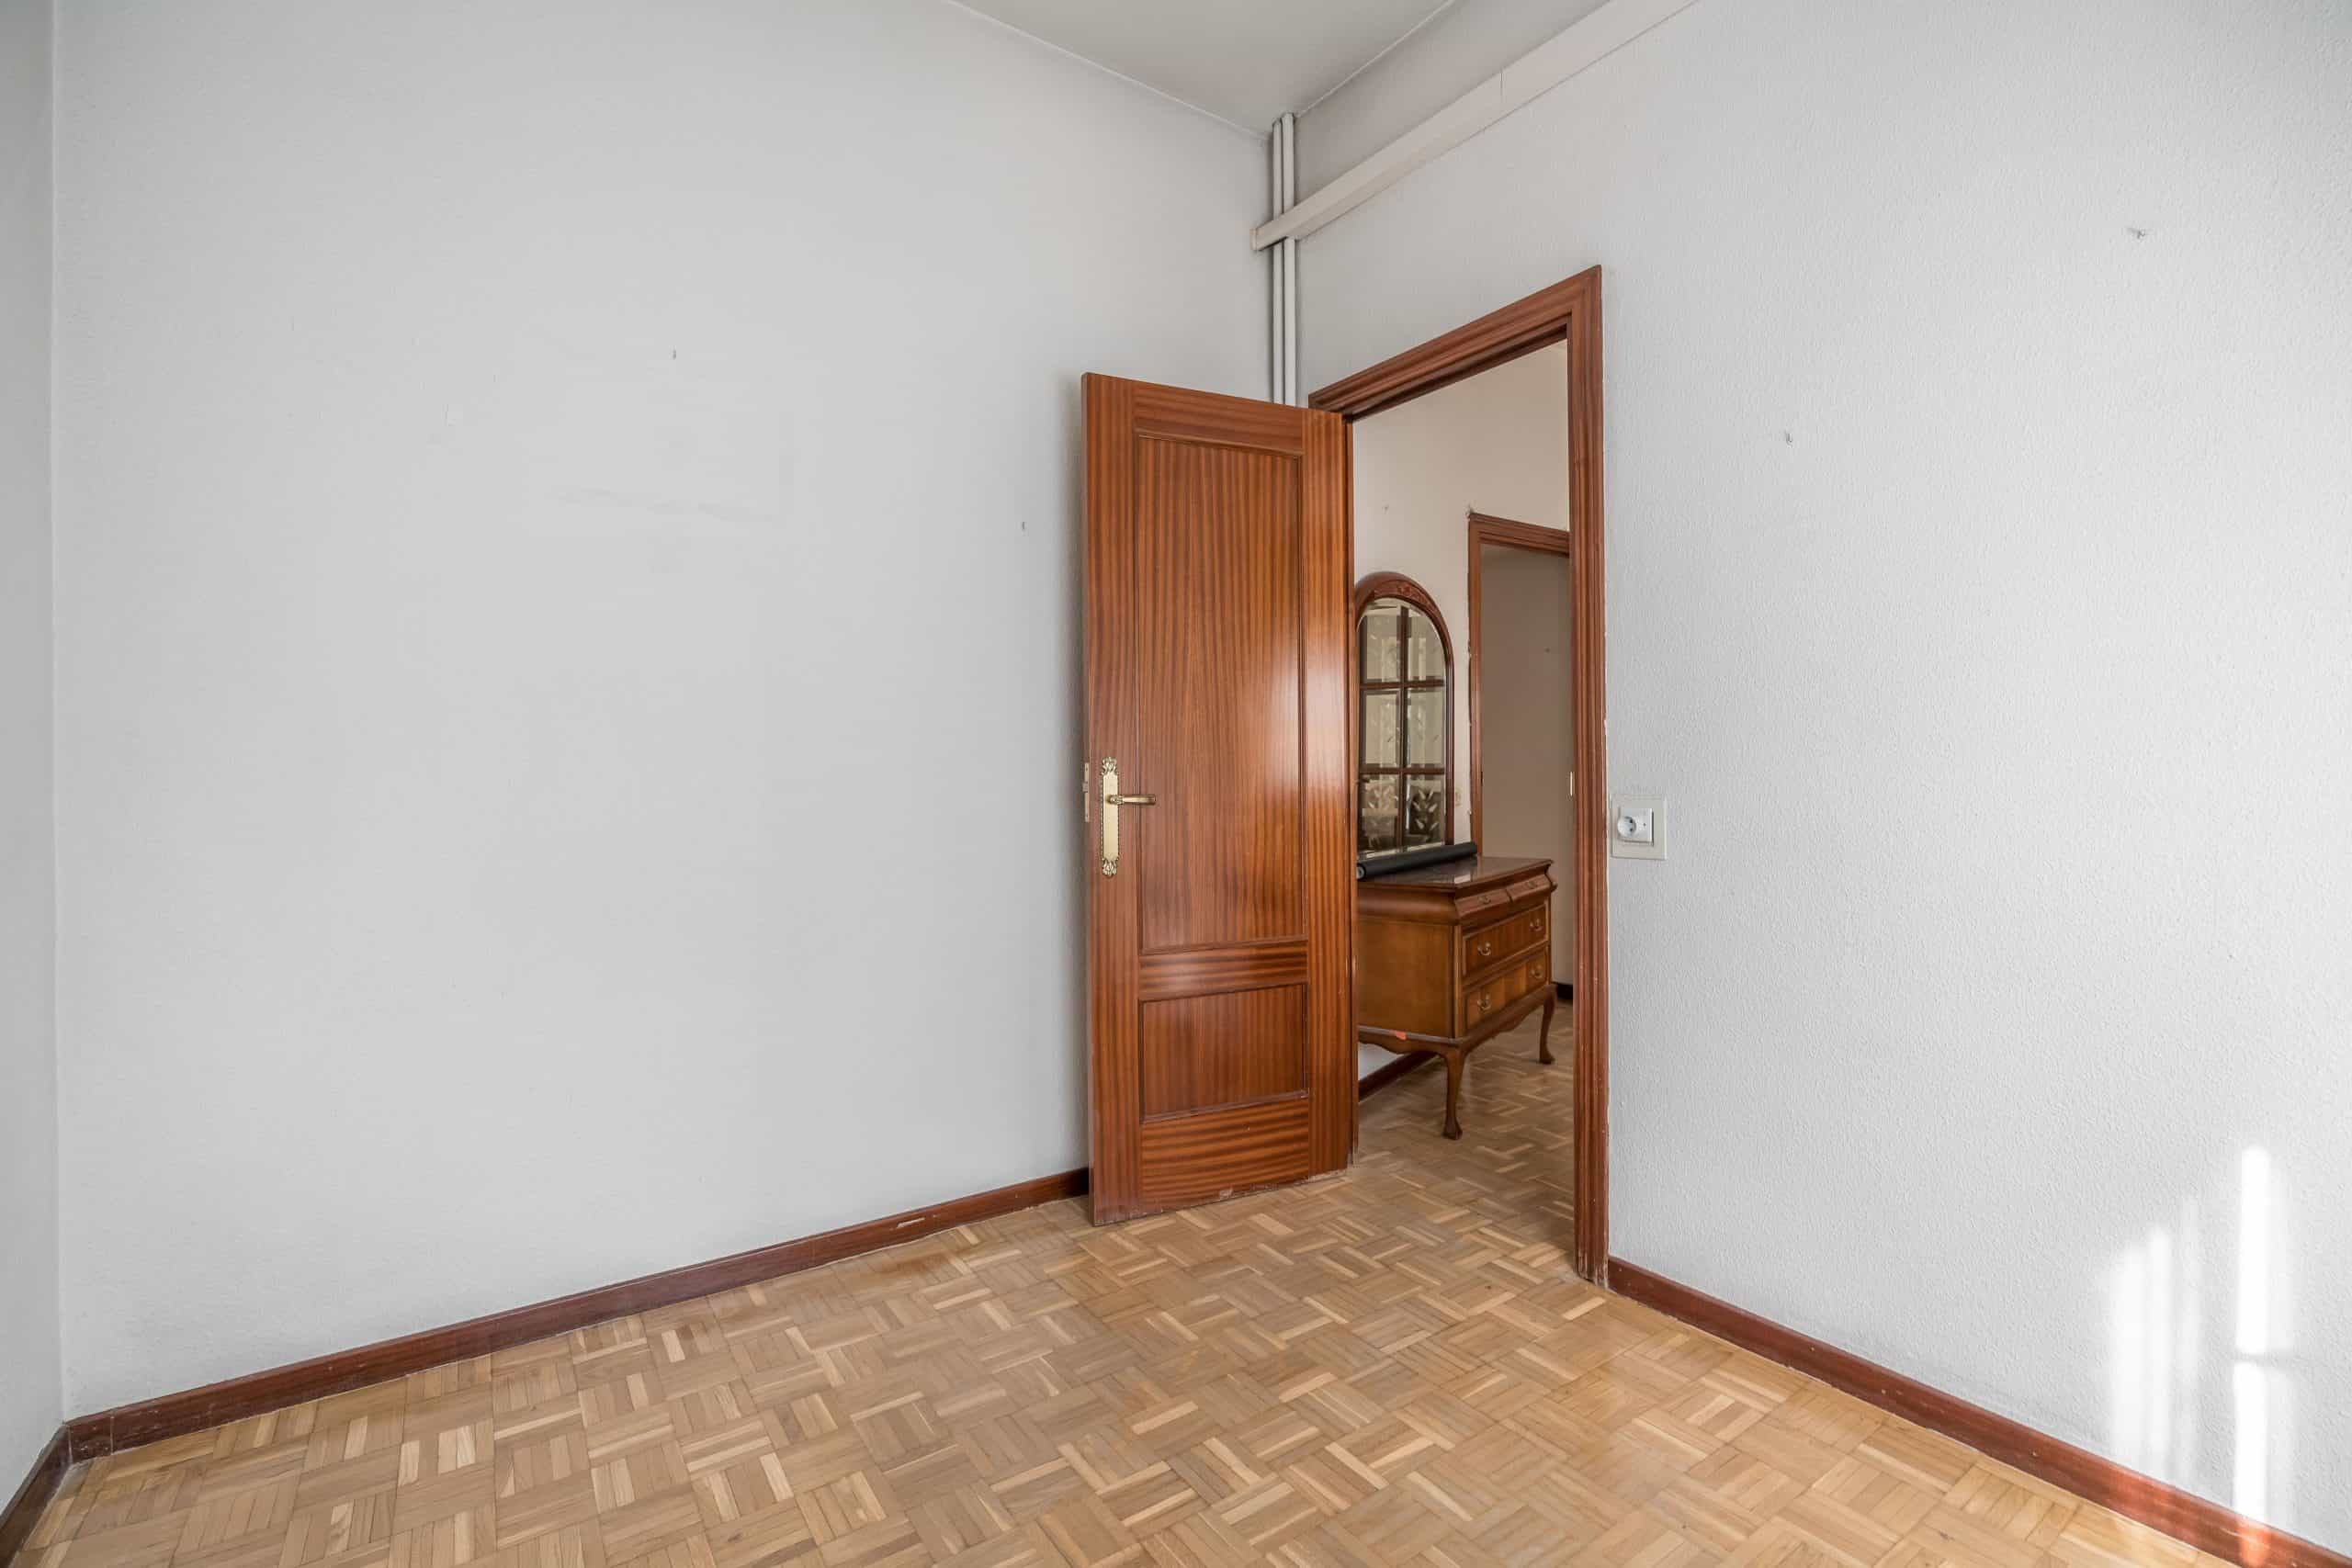 Agencia Inmobiliaria de Madrid-FUTUROCASA-Zona ARGANZUELA-LEGAZPI -calle Jaime Conquistador 48- 2do Dormitorio 4